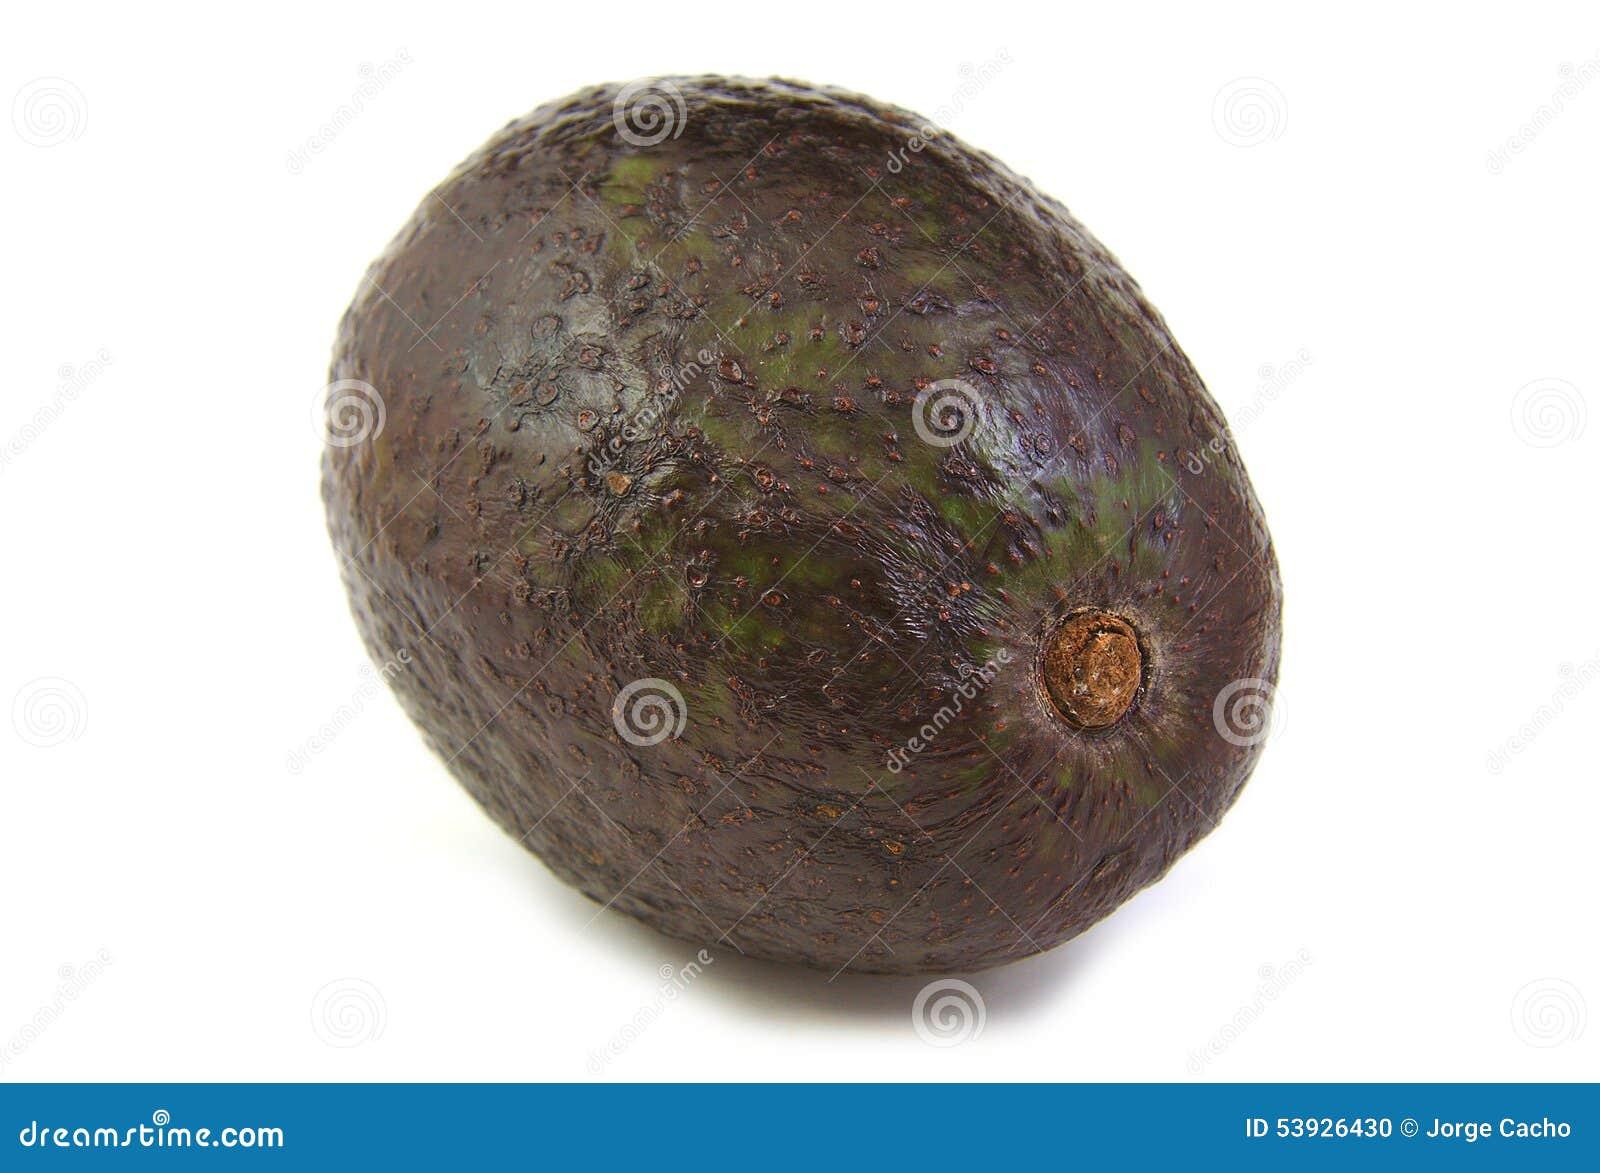 A fresh avocado on a white background